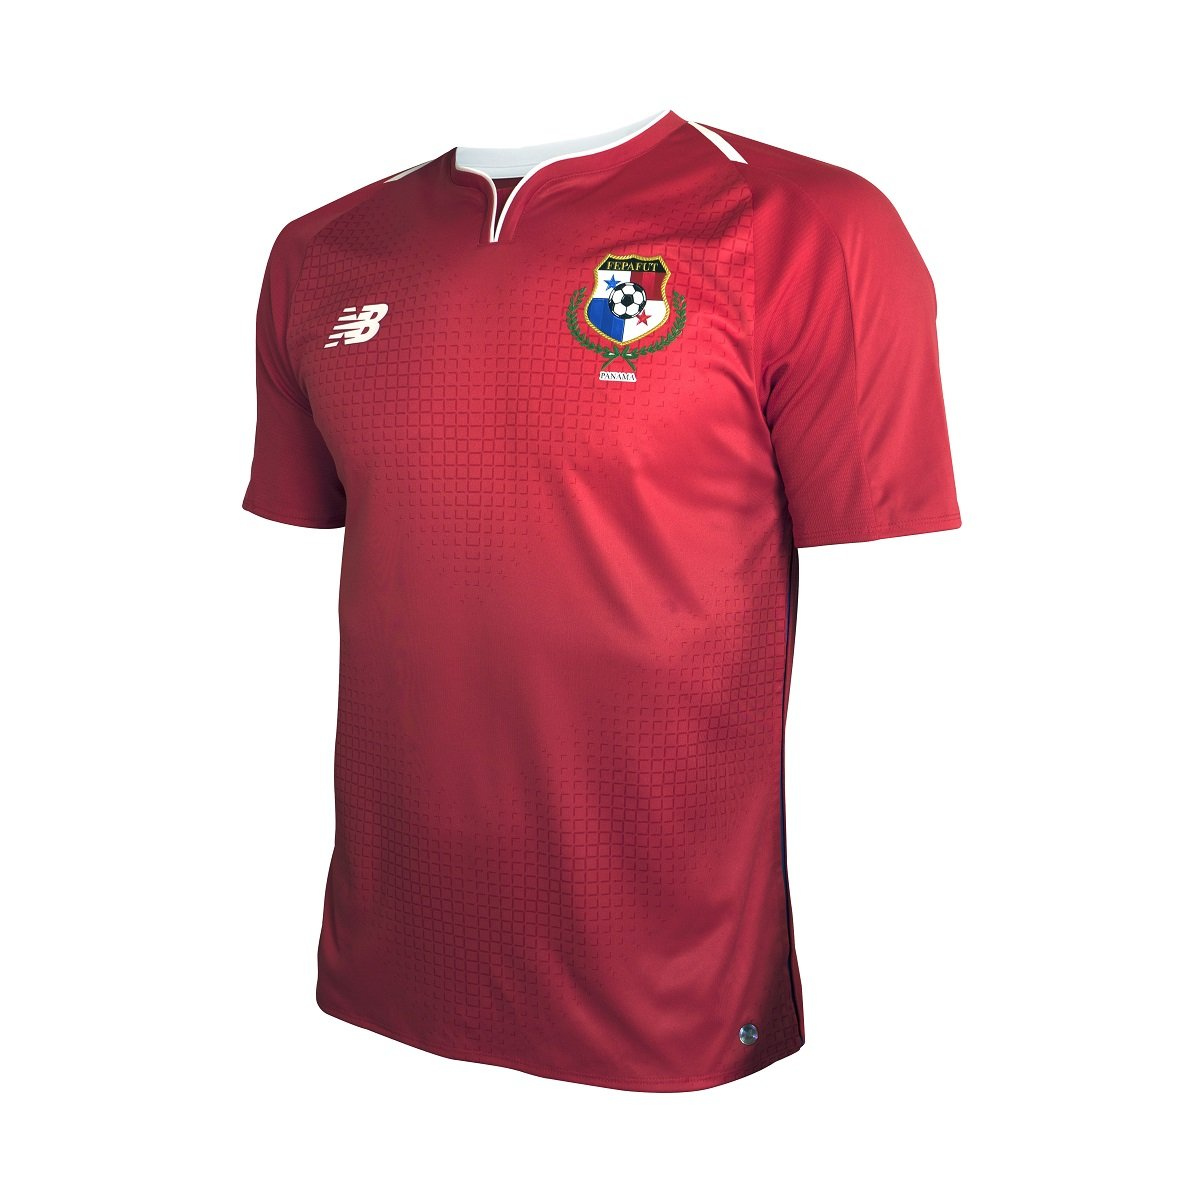 finest selection 6c4a3 0a62f Amazon.com: New Balance Panama Home Soccer Men's Jersey FIFA ...